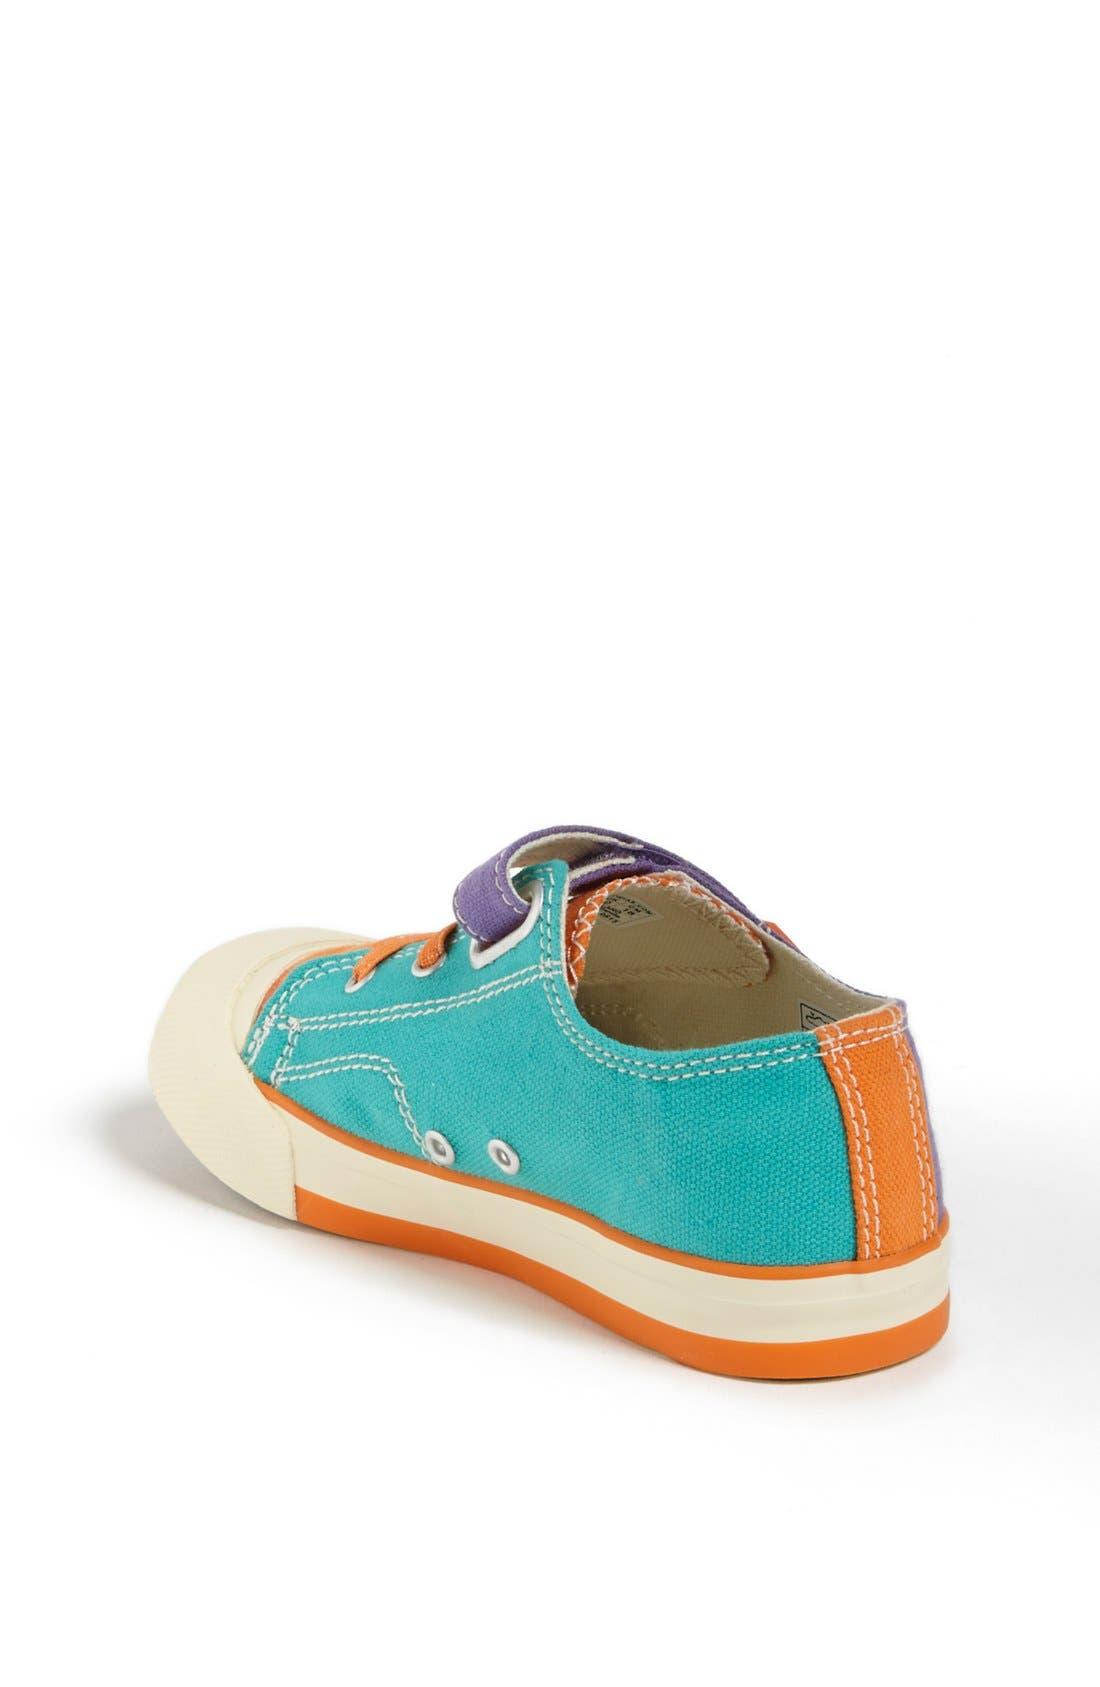 Alternate Image 2  - Keen 'Coronado' Sneaker (Toddler & Little Kid)